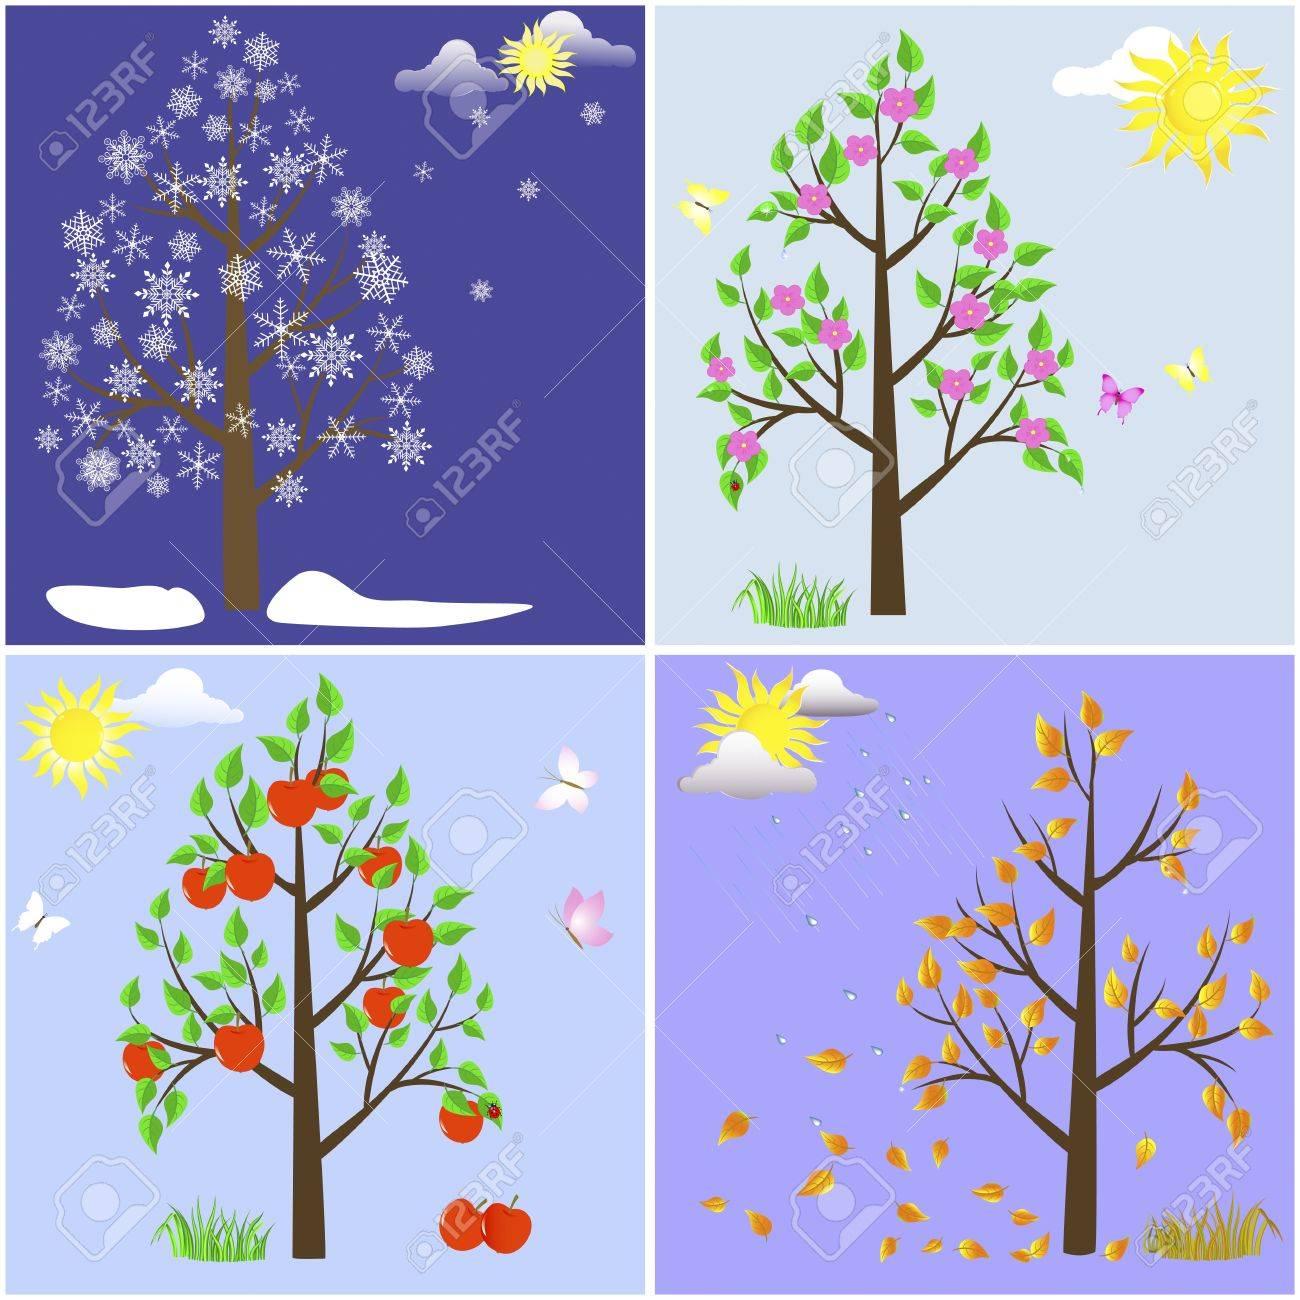 Trees in four seasons-spring, summer, autumn, winter Stock Vector - 17533561